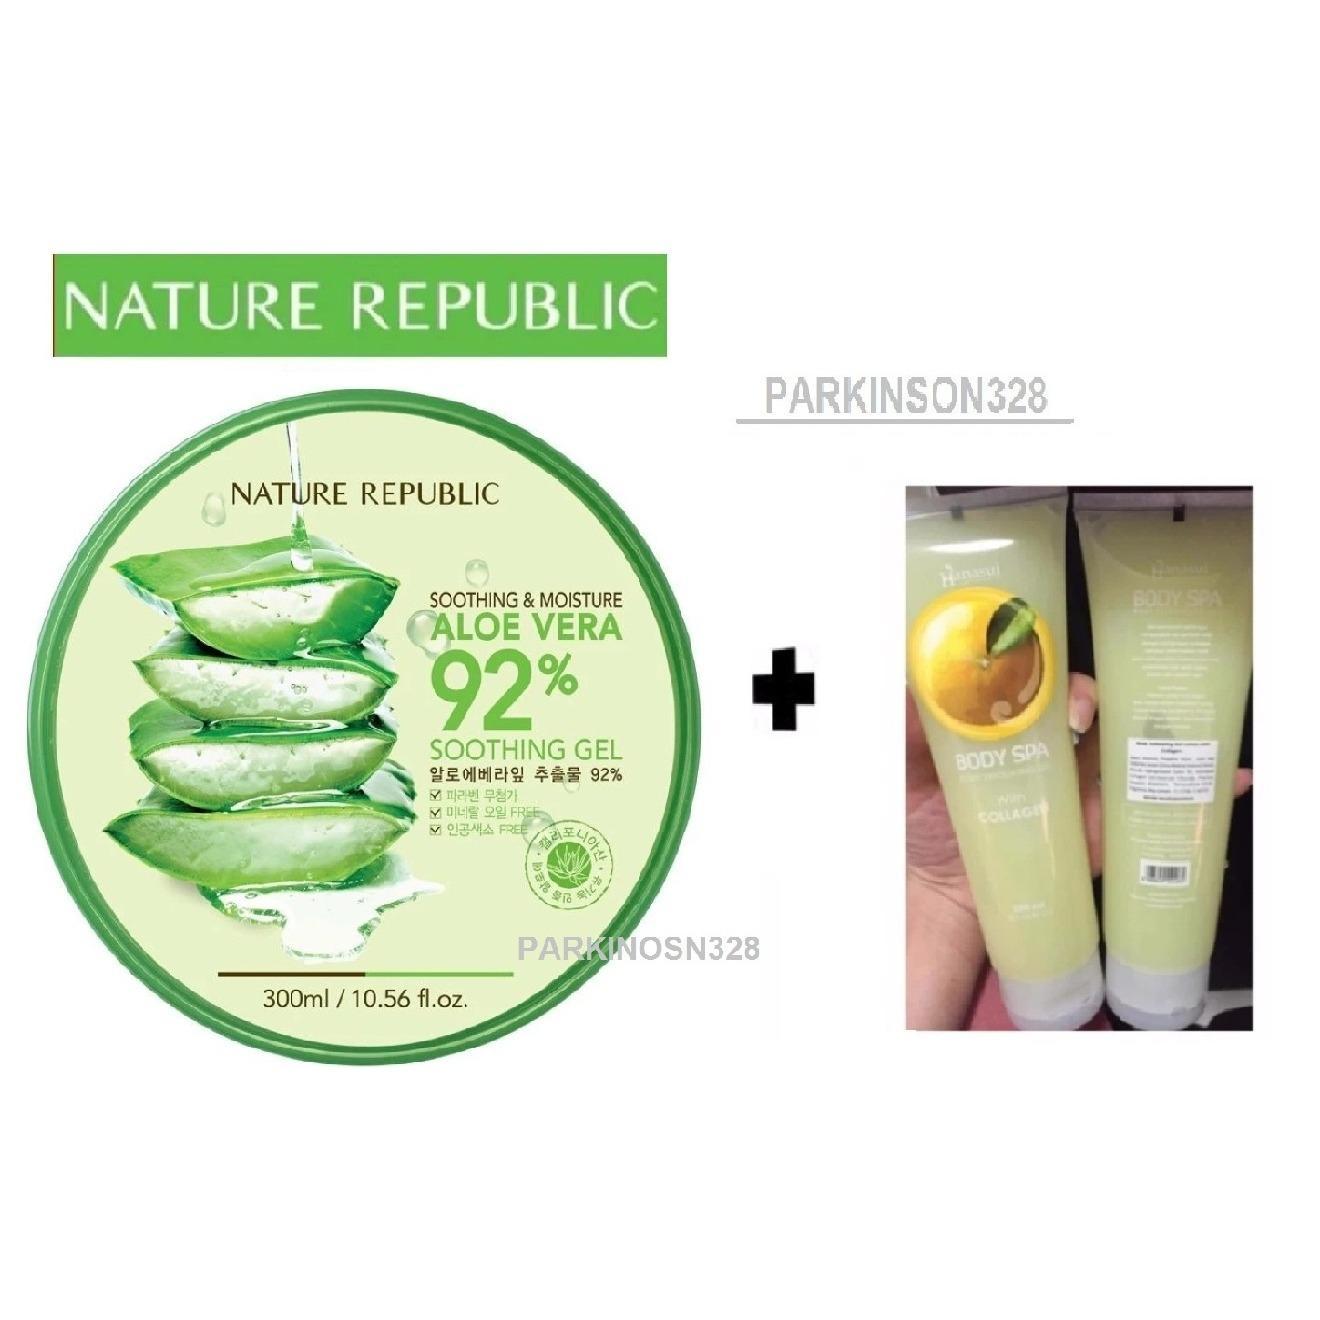 Buy Sell Cheapest Aloe Vera Spa Best Quality Product Deals Body Scrub Peeling Gel Shop Perontok Daki Bodyspa Nature Republic Original Korea Soothing Moisture 92 300ml